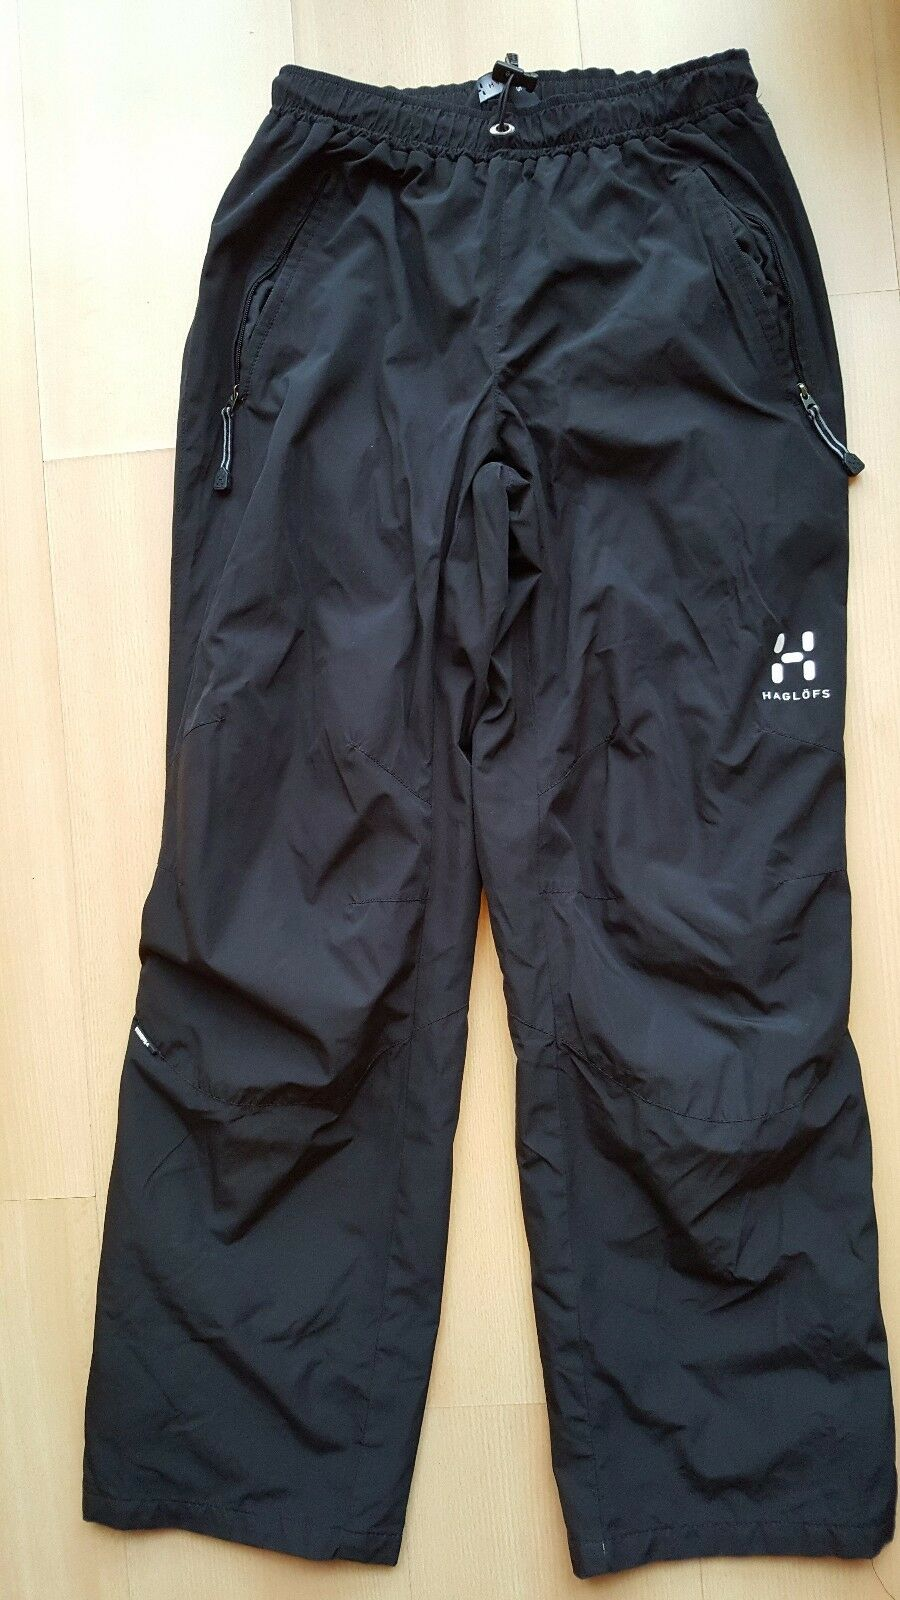 HAGLOFS Gore Windstopper Trekking Hiking Pants Trousers Women's Size EU34, S XS